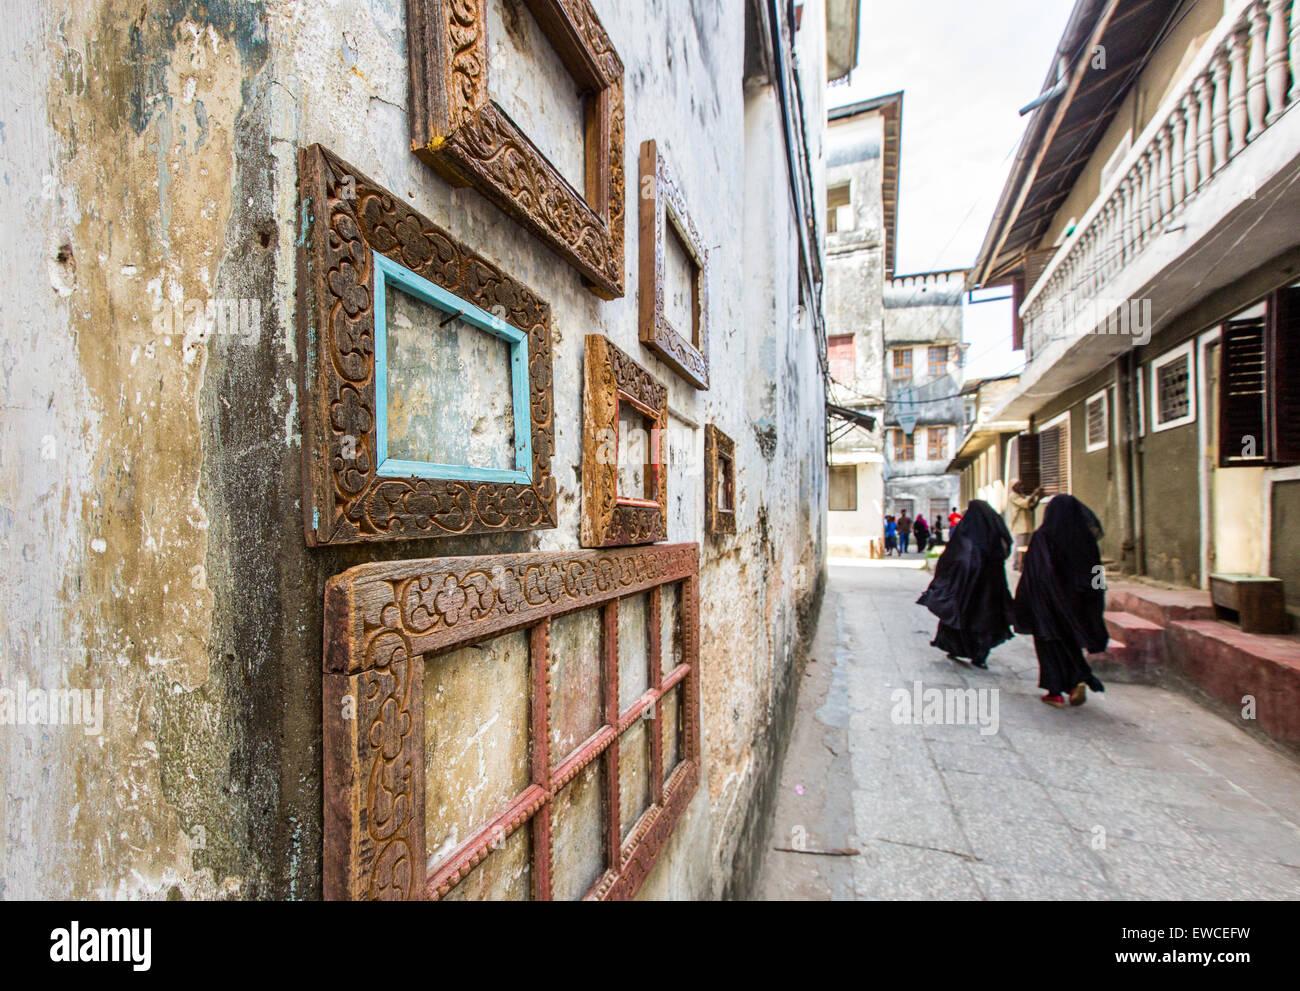 Veiled women walk past picture frames in Stone Town, Zanzibar. - Stock Image